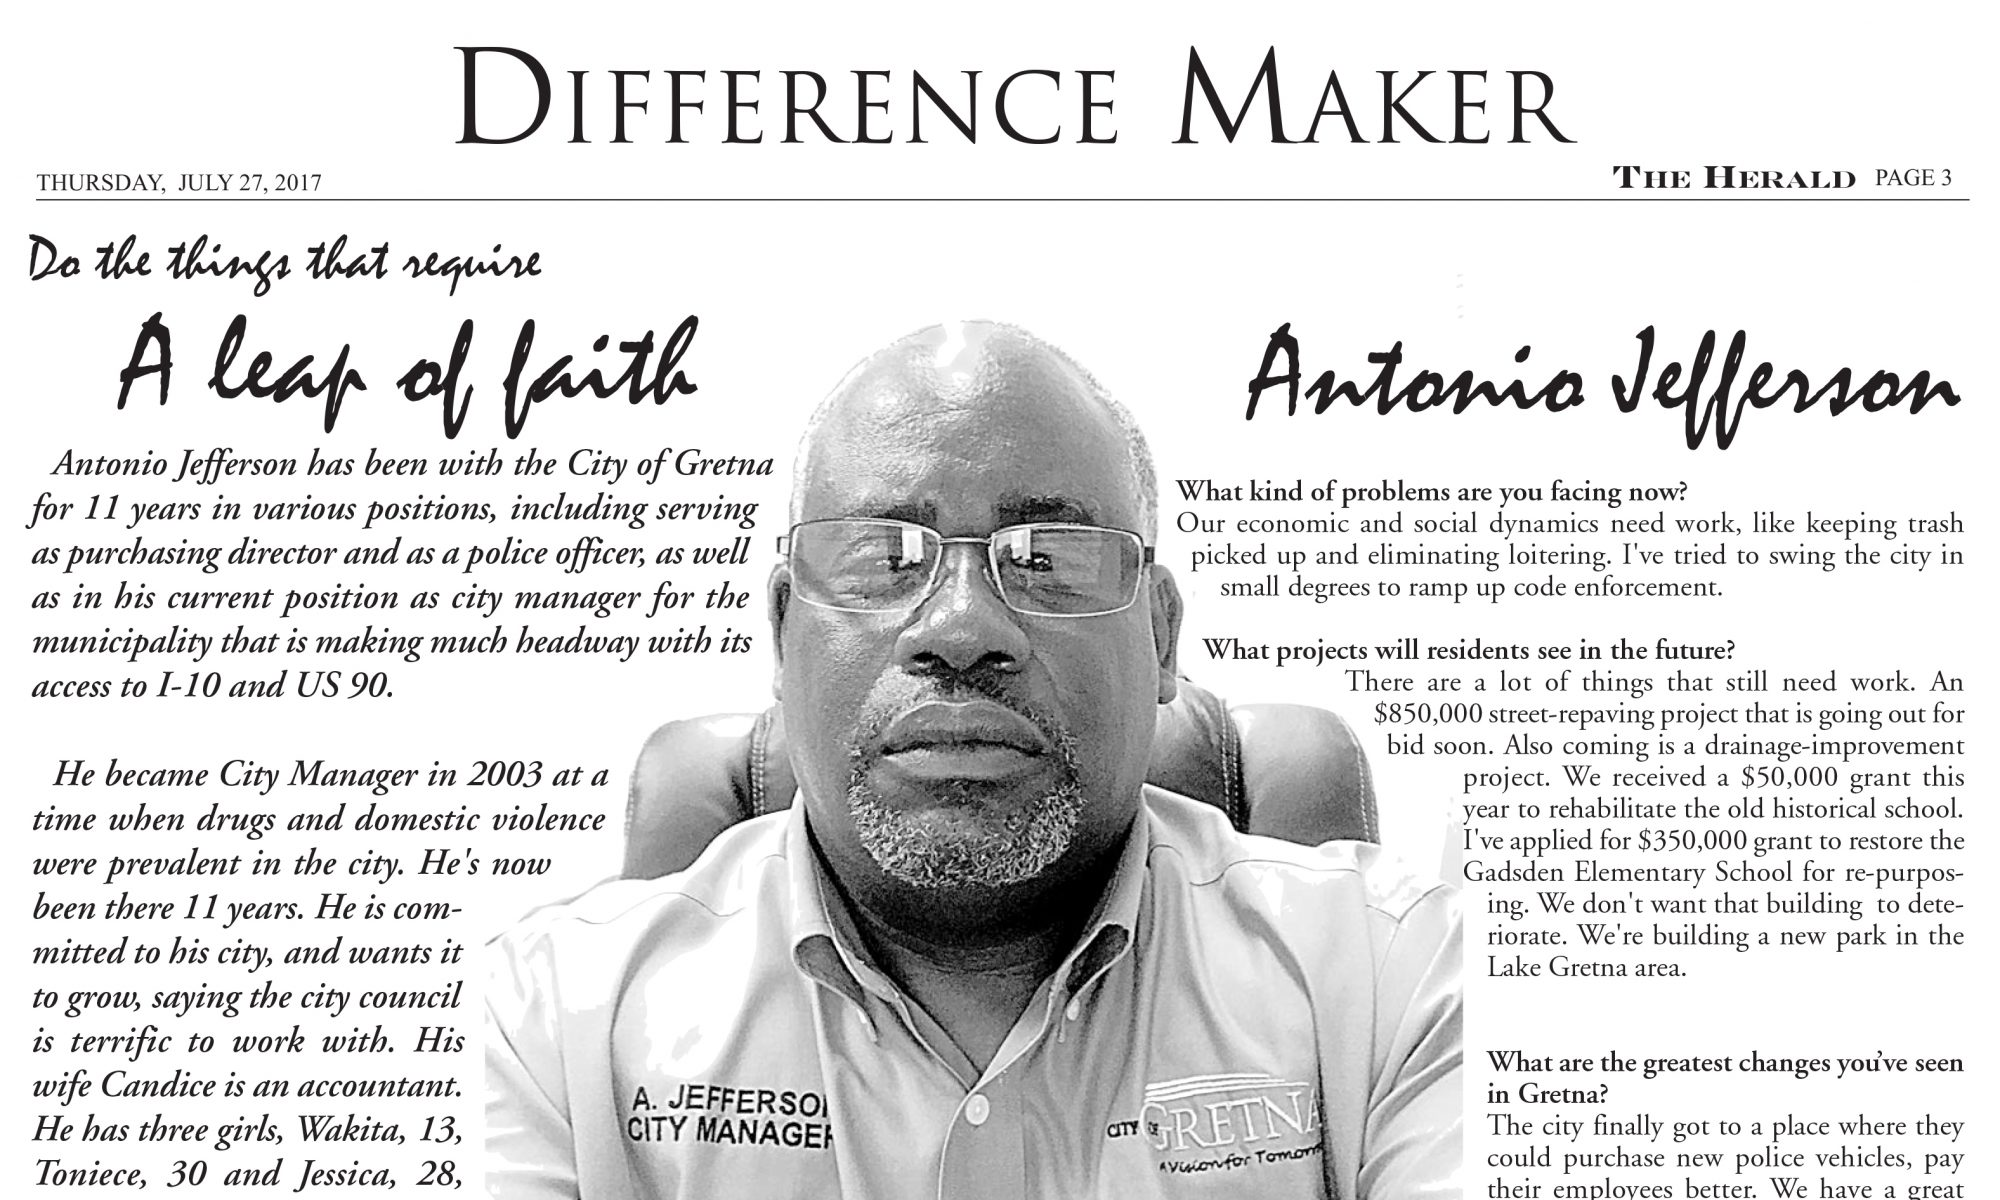 Difference Maker Antonio Jefferson